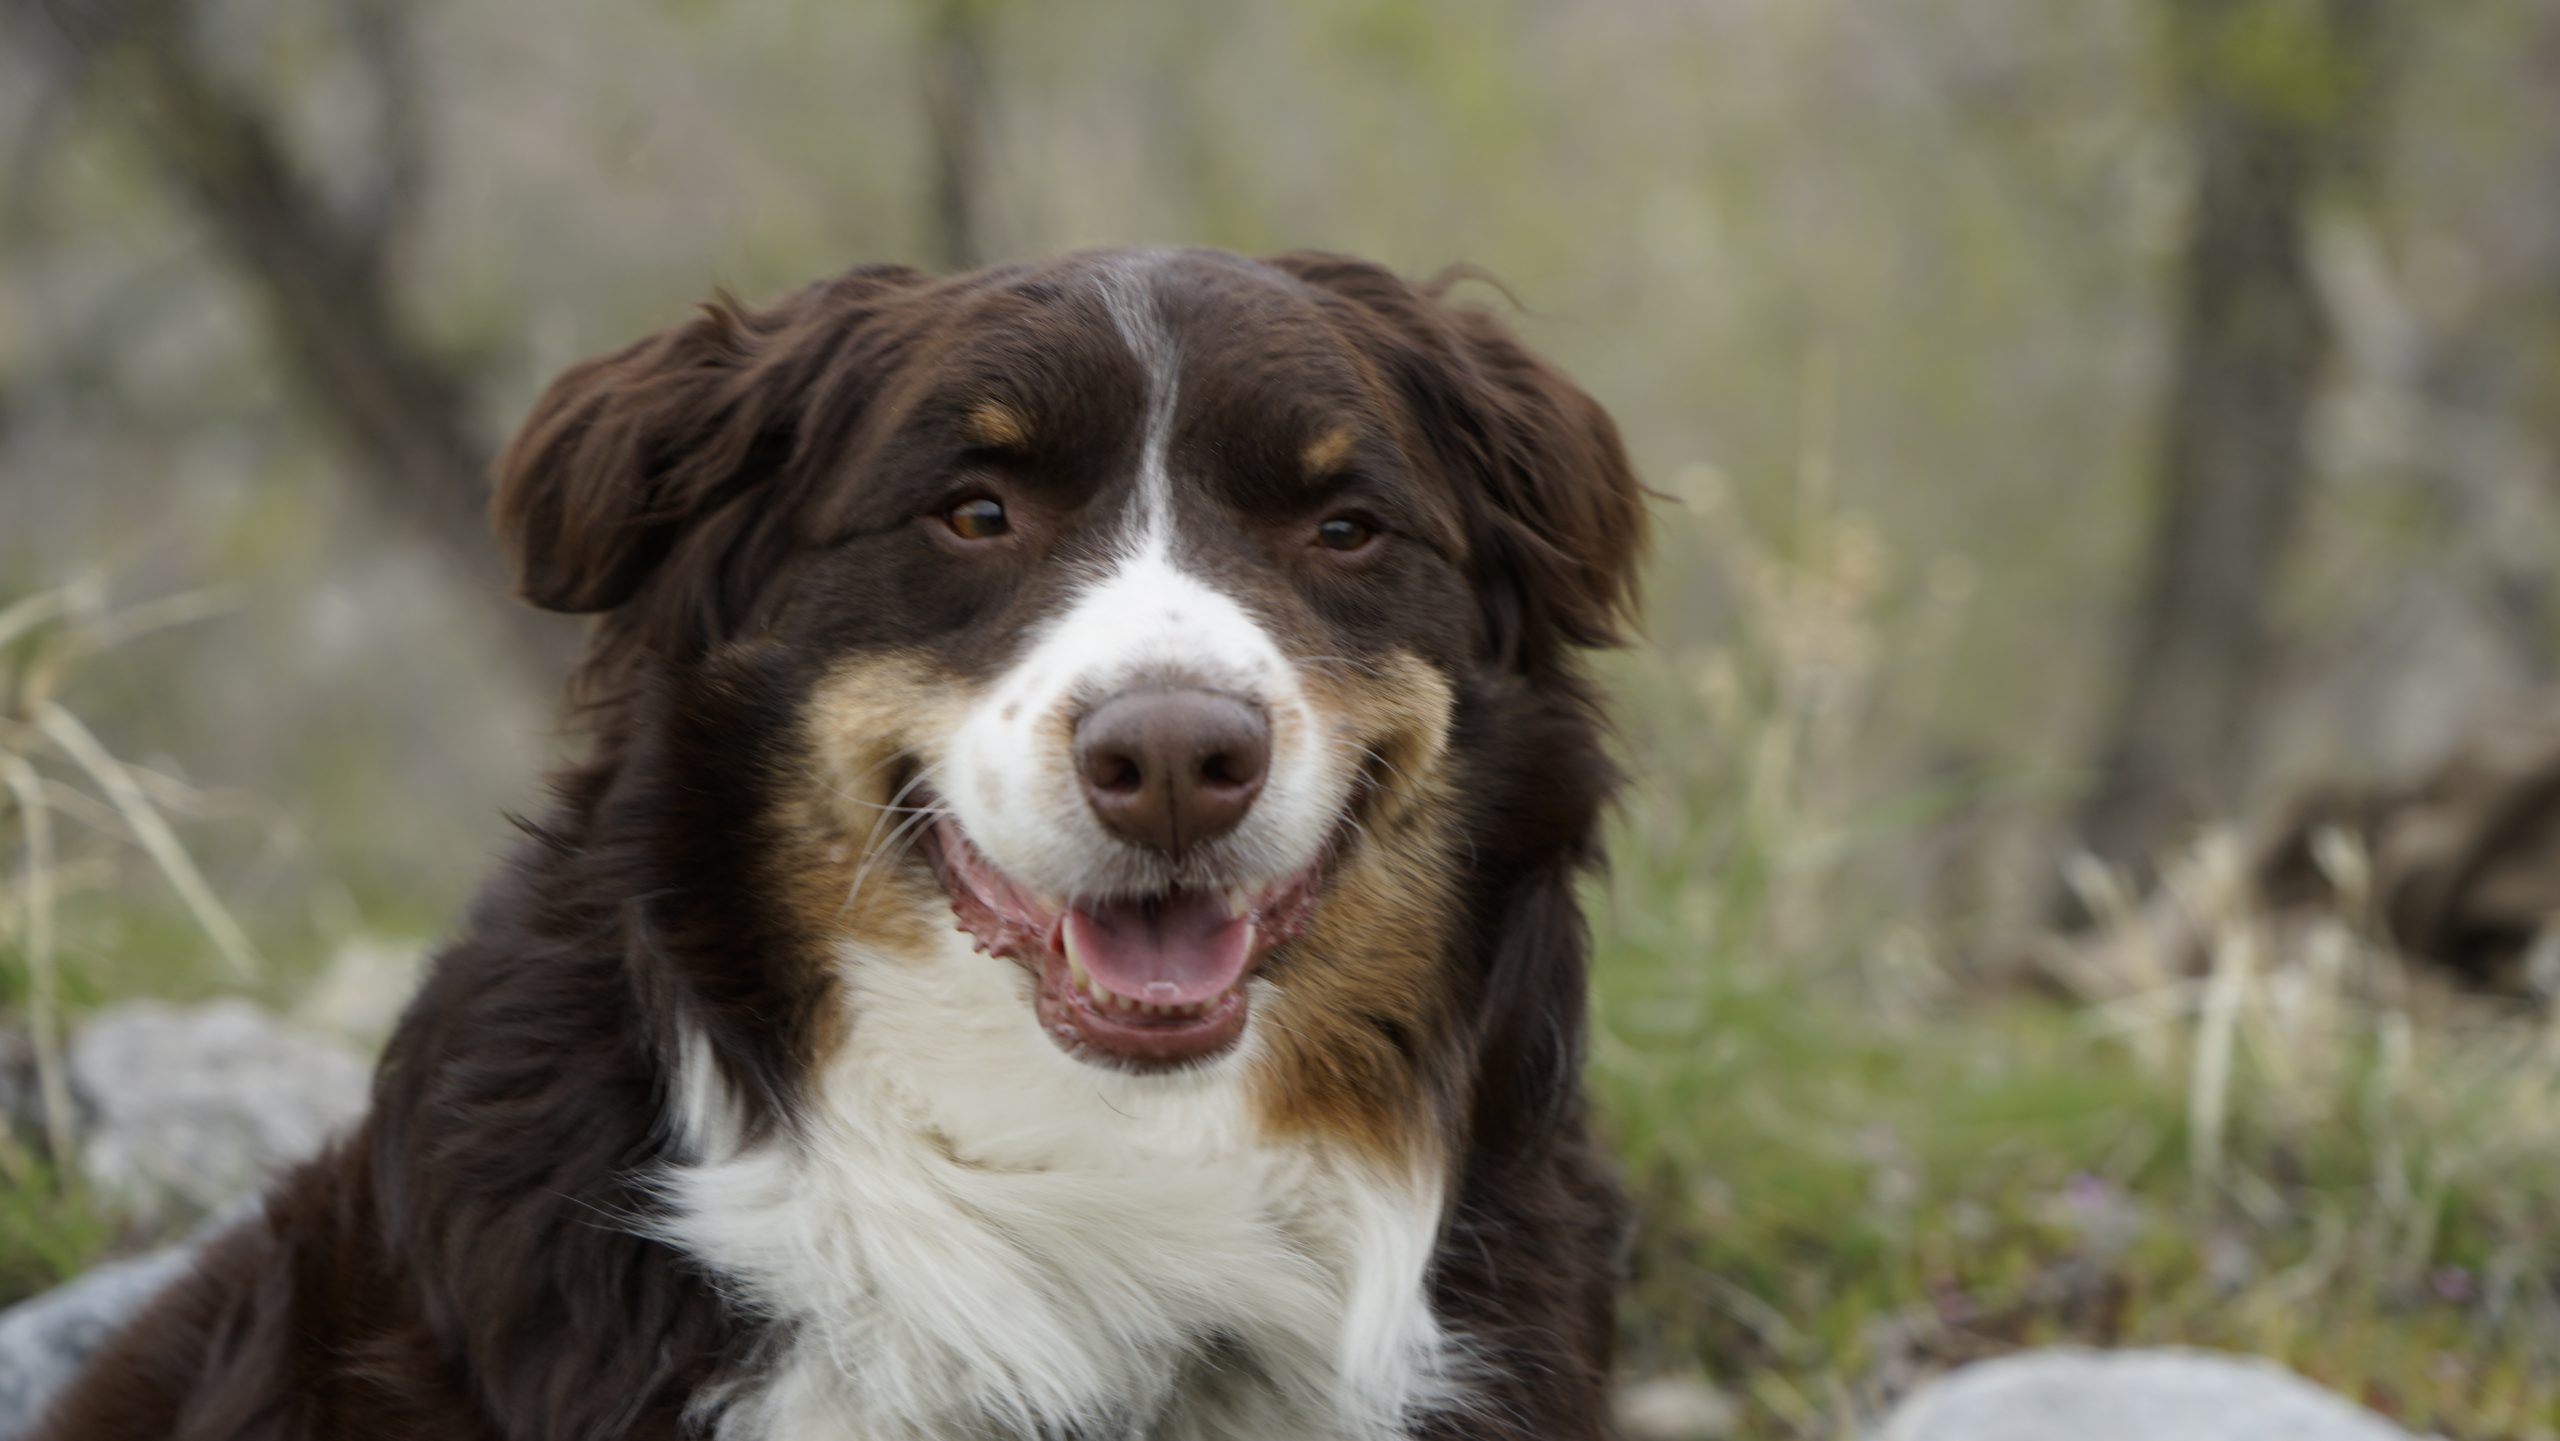 Smiling Australian Shepherd is top dog